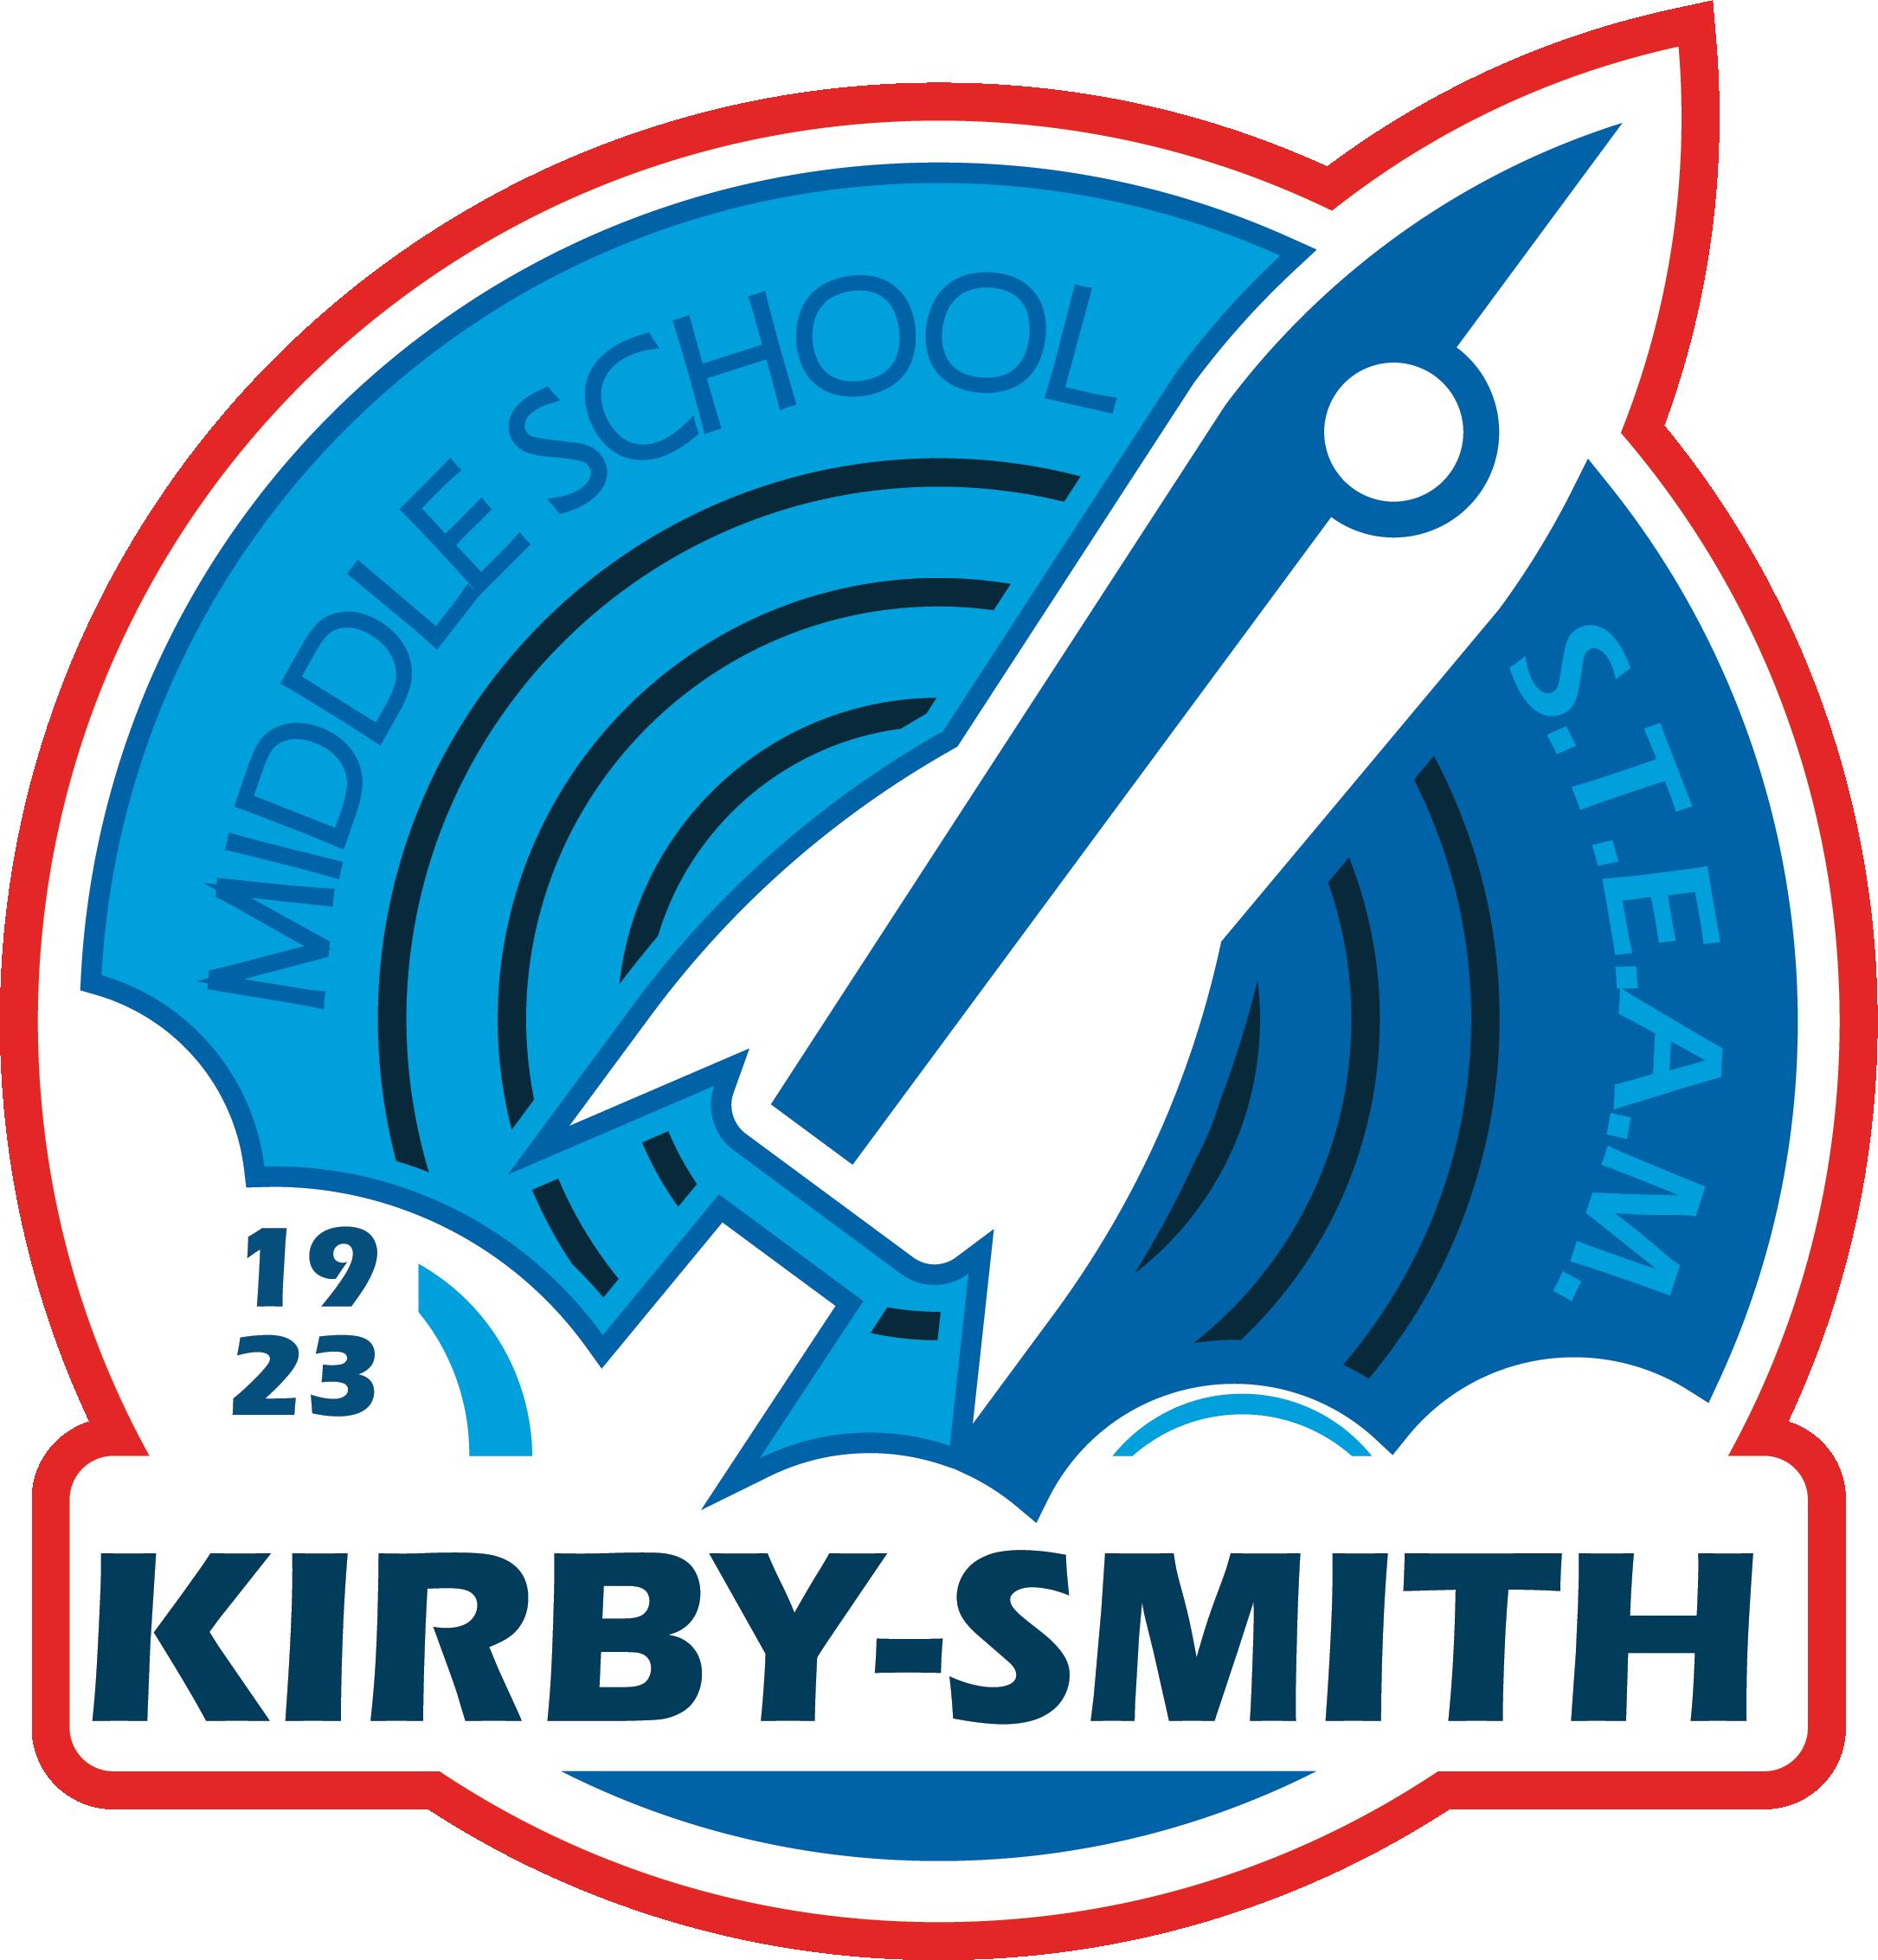 Duval County School Calendar 2020-2021 Kirby Smith Middle School / Kirby Smith Middle School Calendar